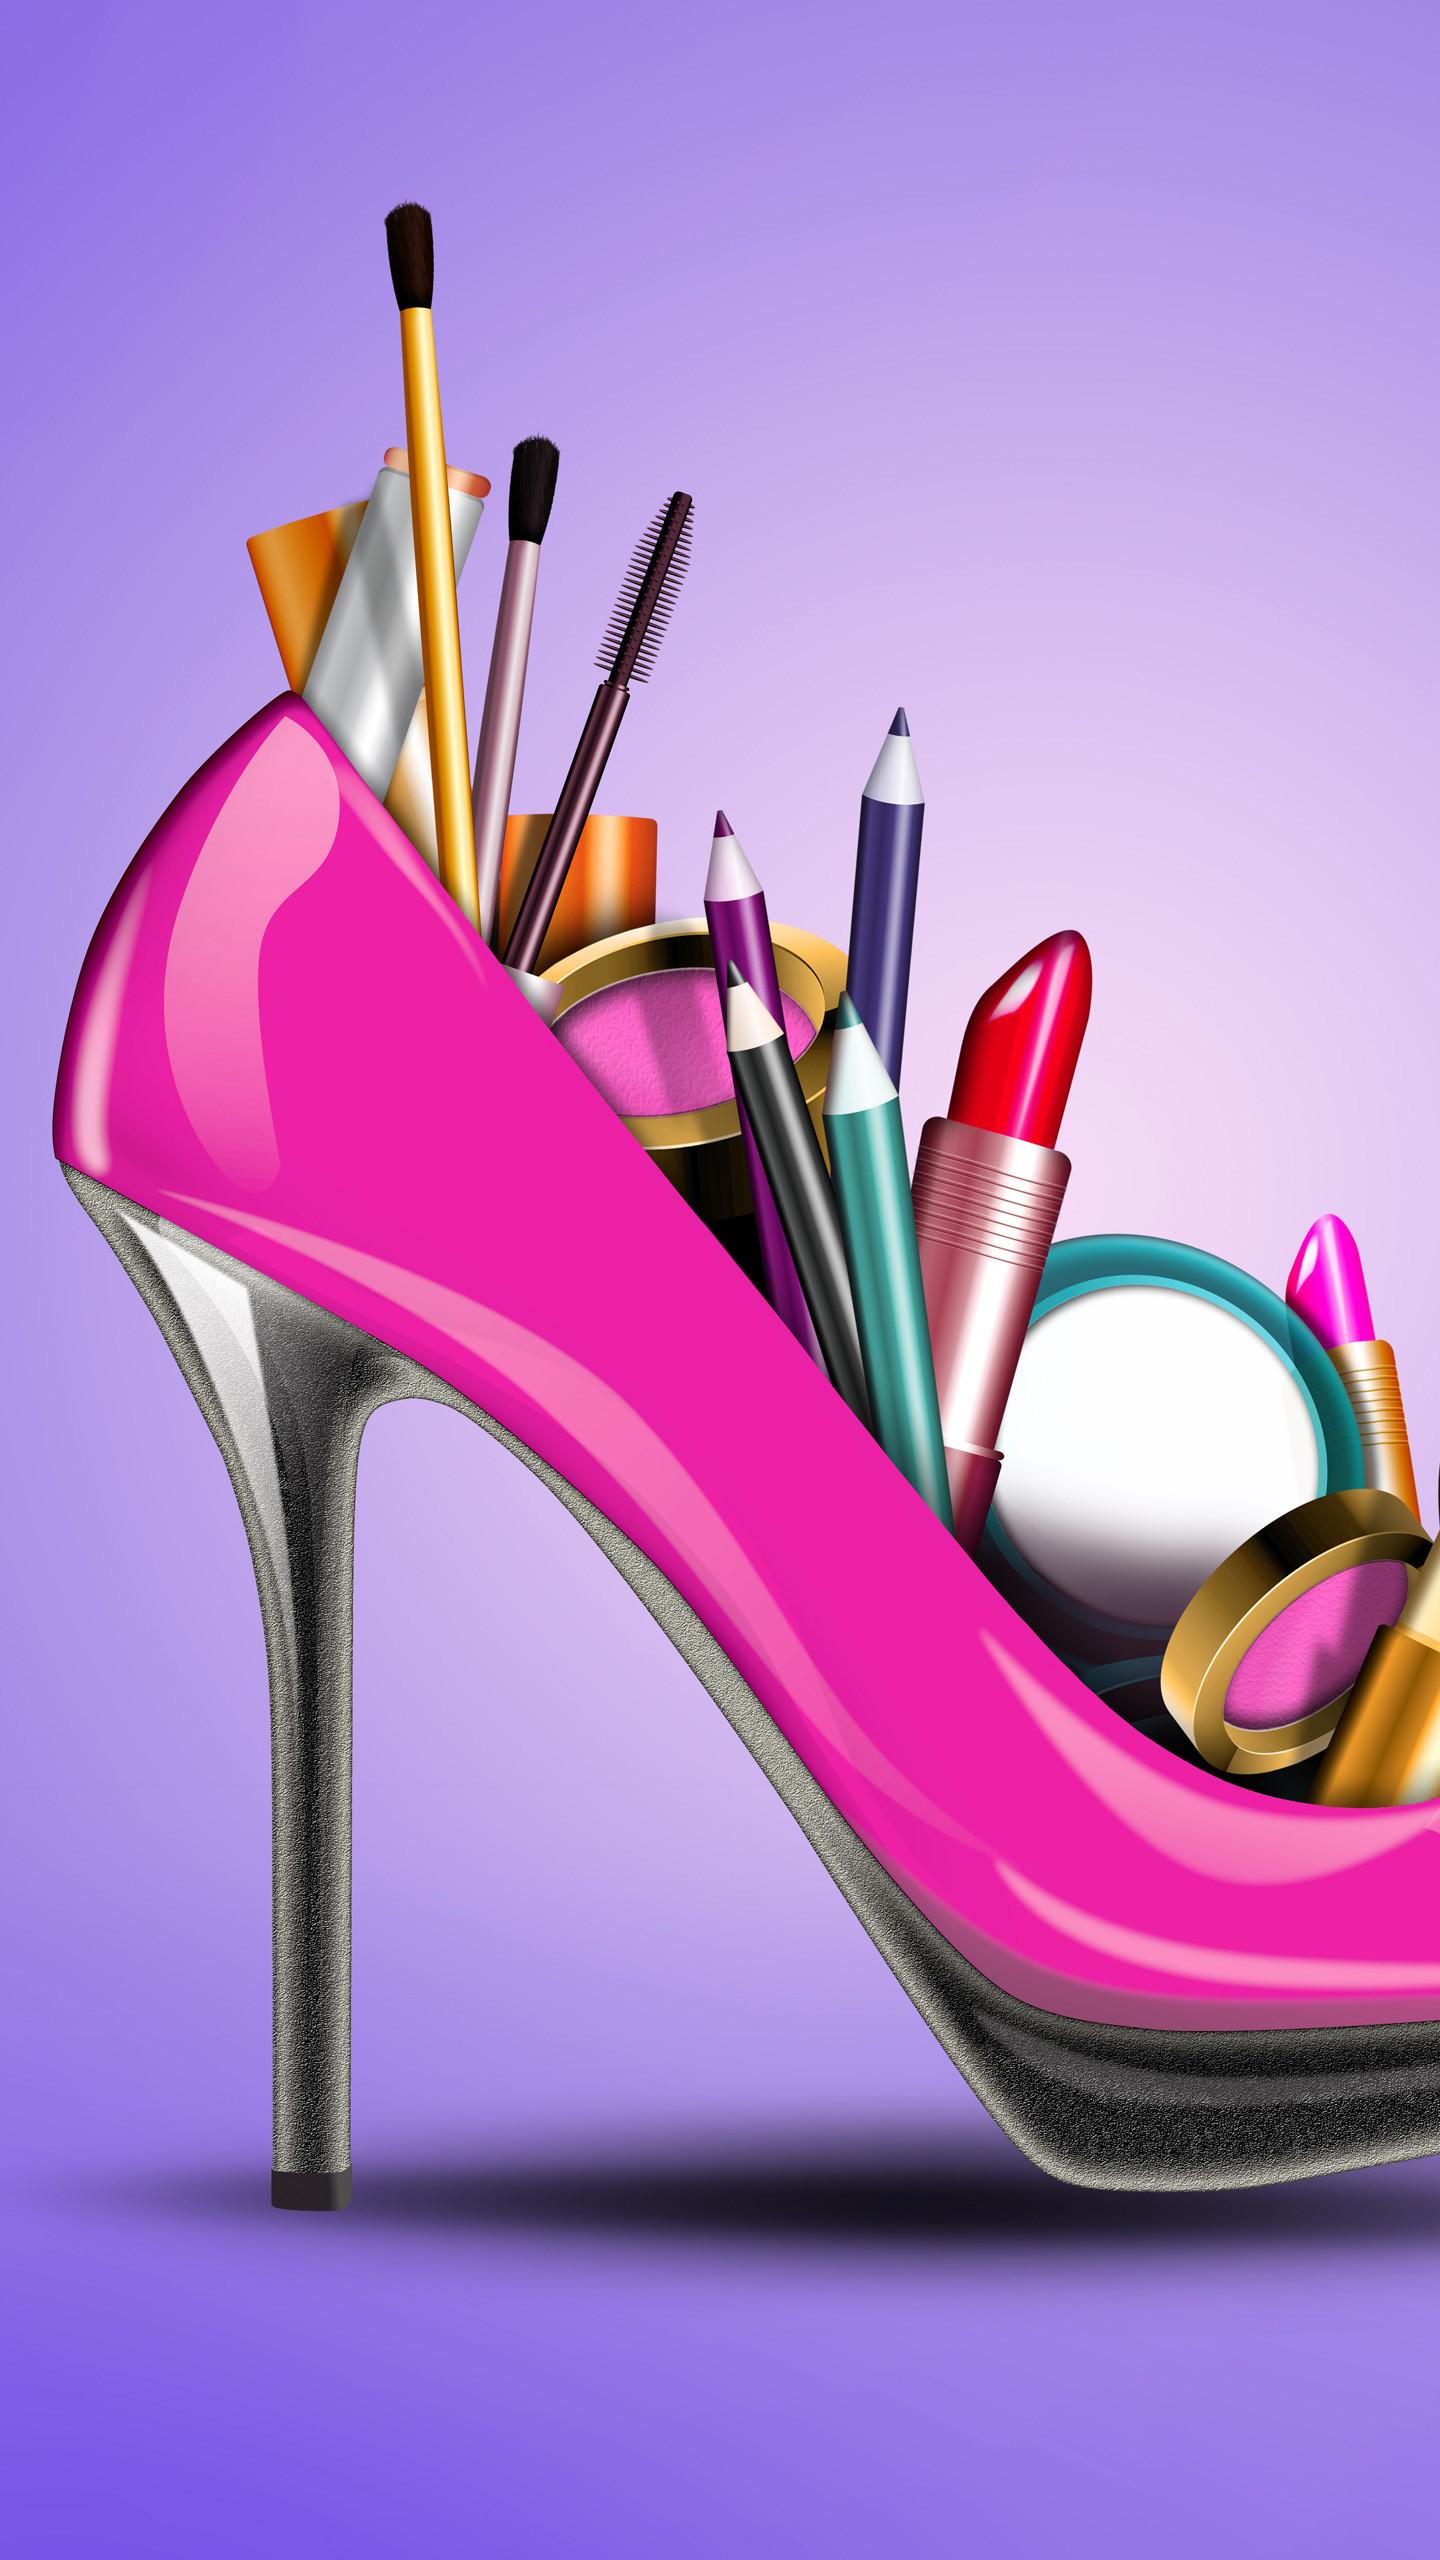 Pink Girly Desktop Wallpaper (56+ images)